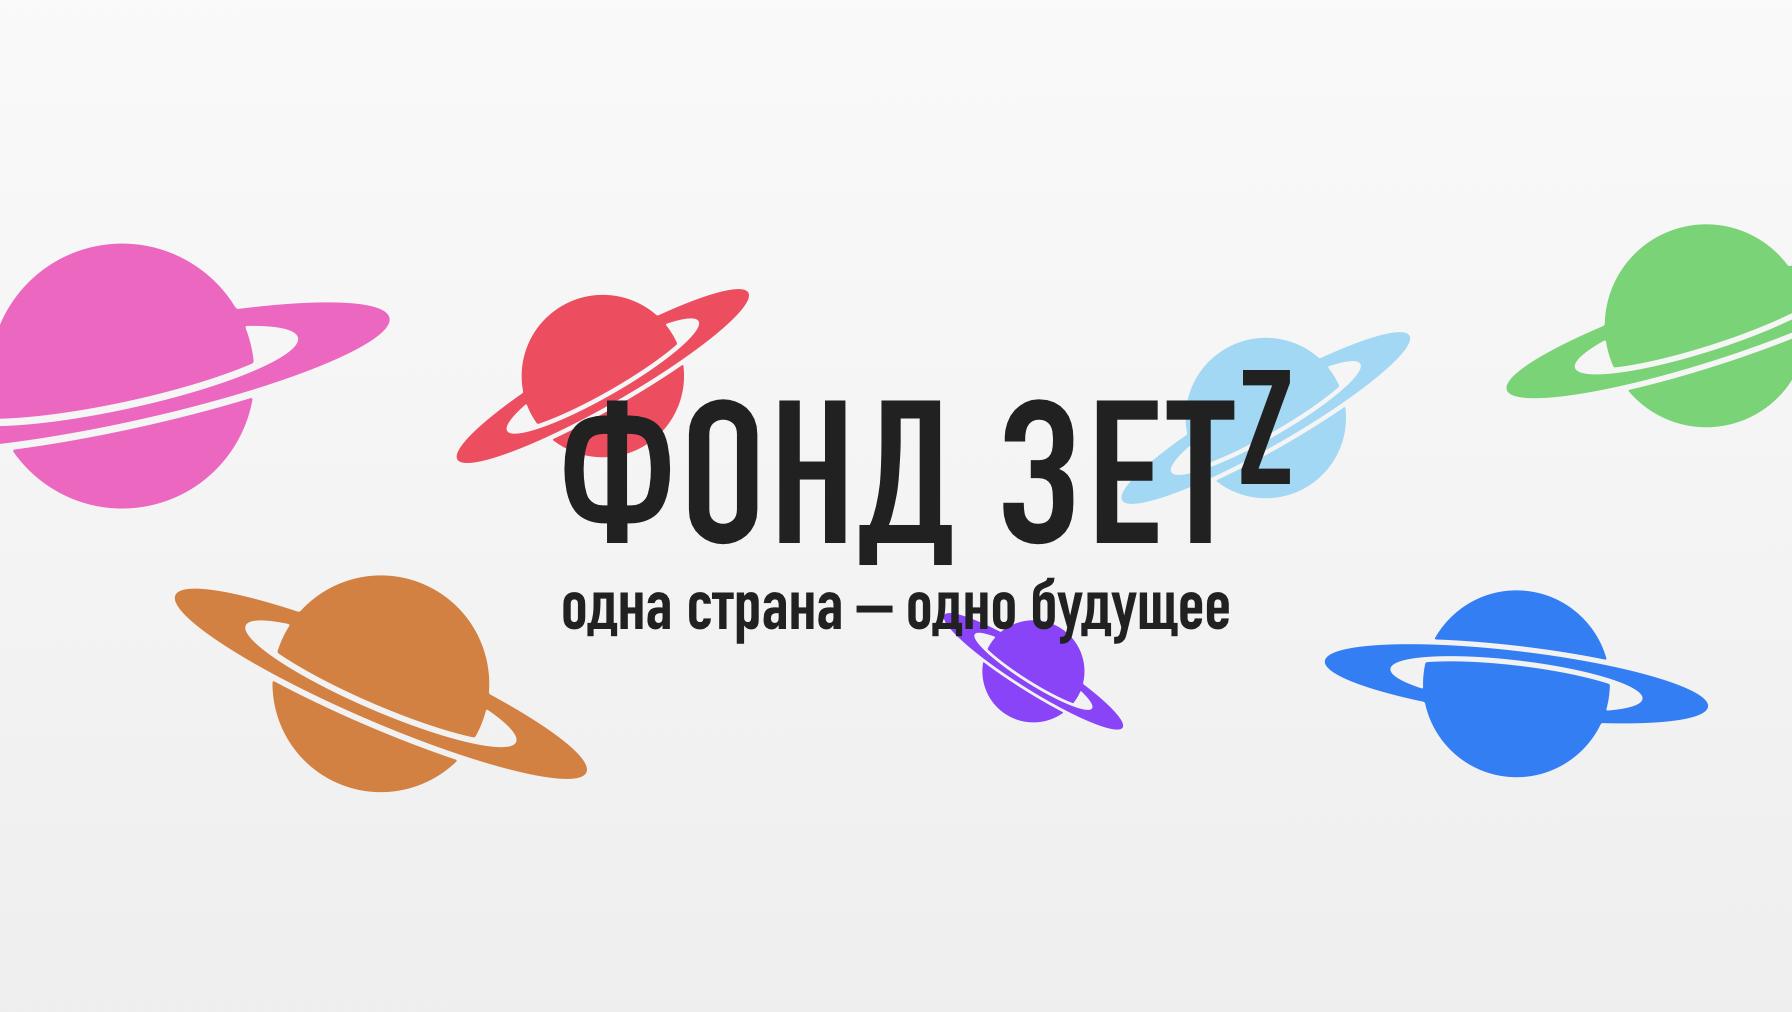 oohd-npoekthoro-pa3bntnr-ttokojiehne-3et